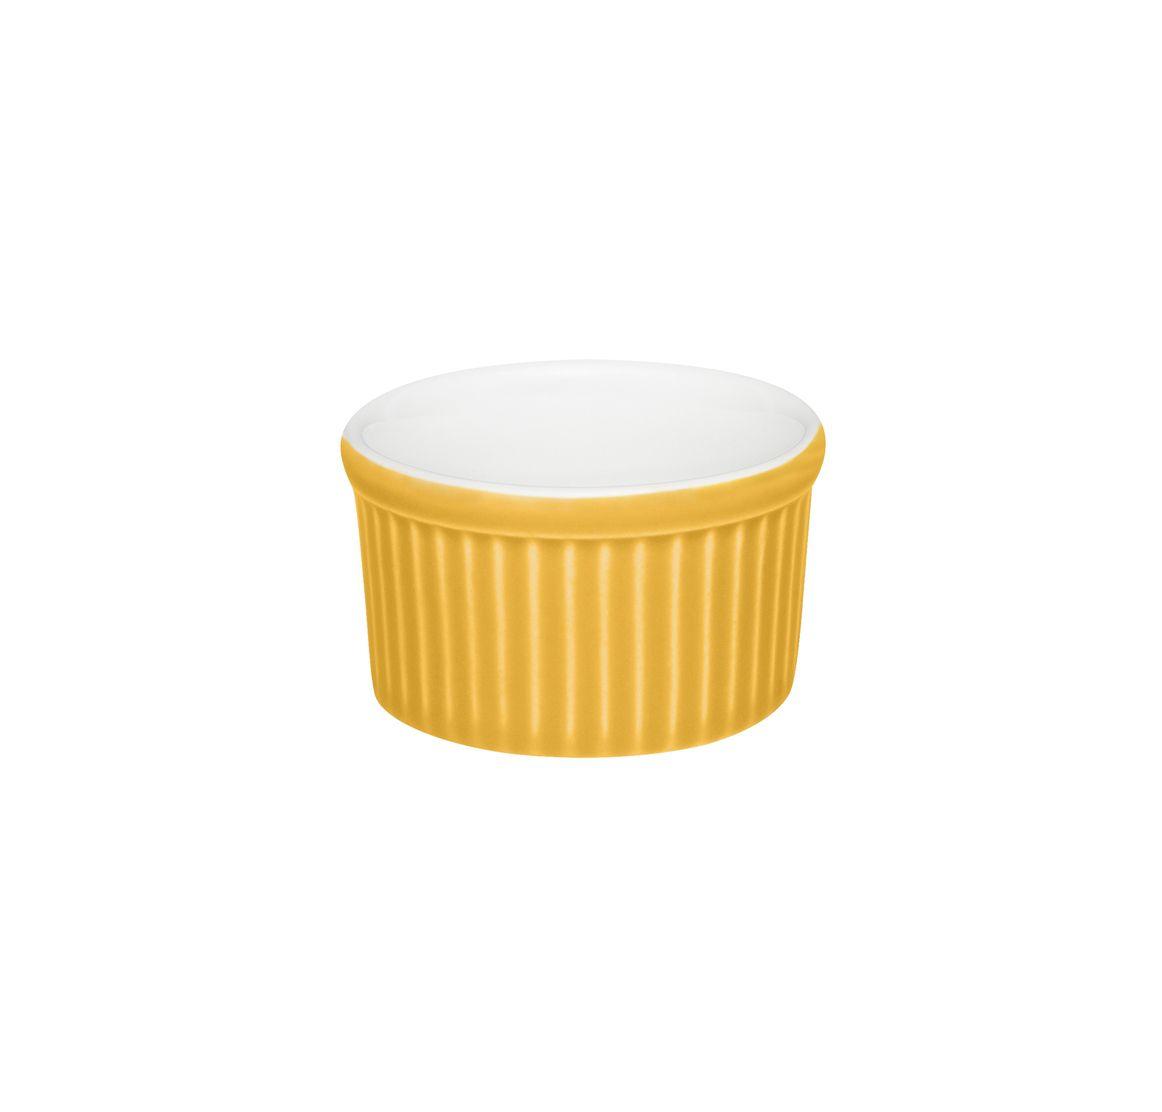 Tigela Ramequin 6X3Cm 50Ml - Branco/Amarelo - Oxford Cookware